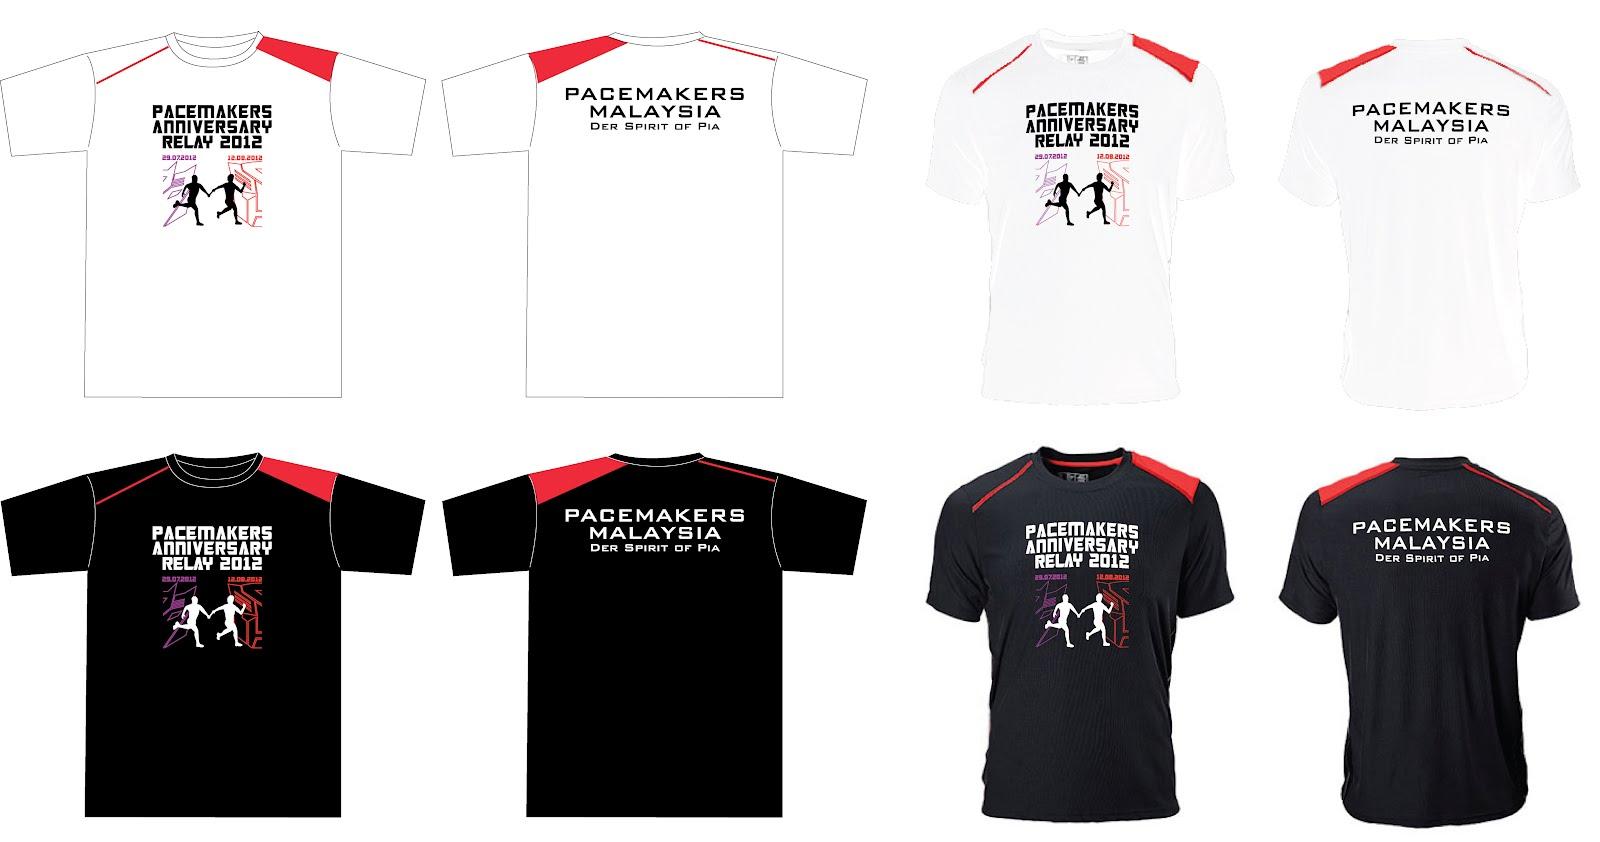 Shirt design malaysia - Pacemakers Anniversary Run 2012 T Shirt Design